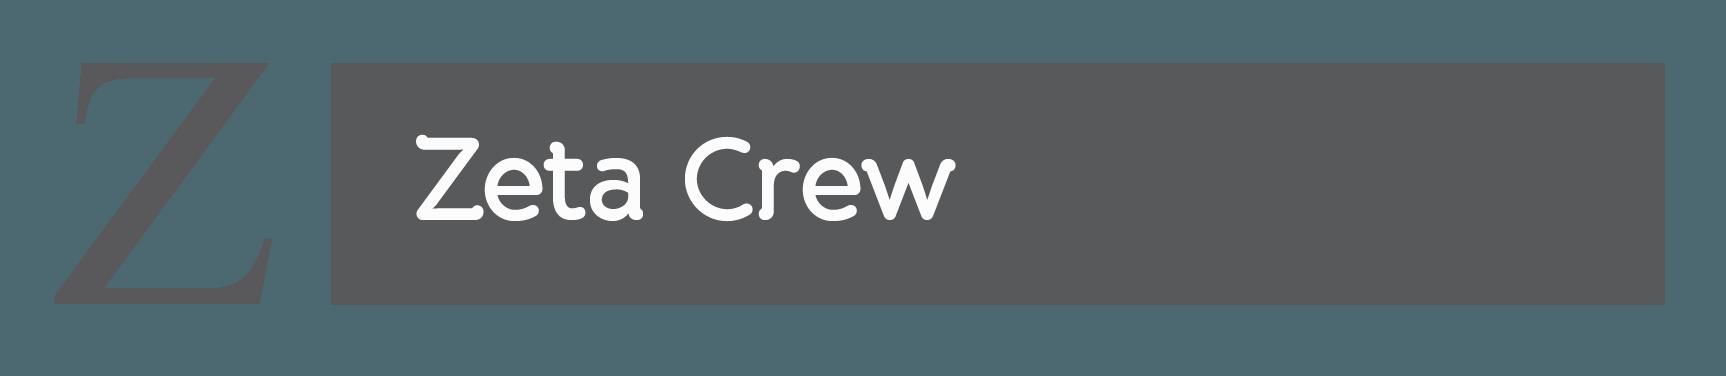 Zeta Crew